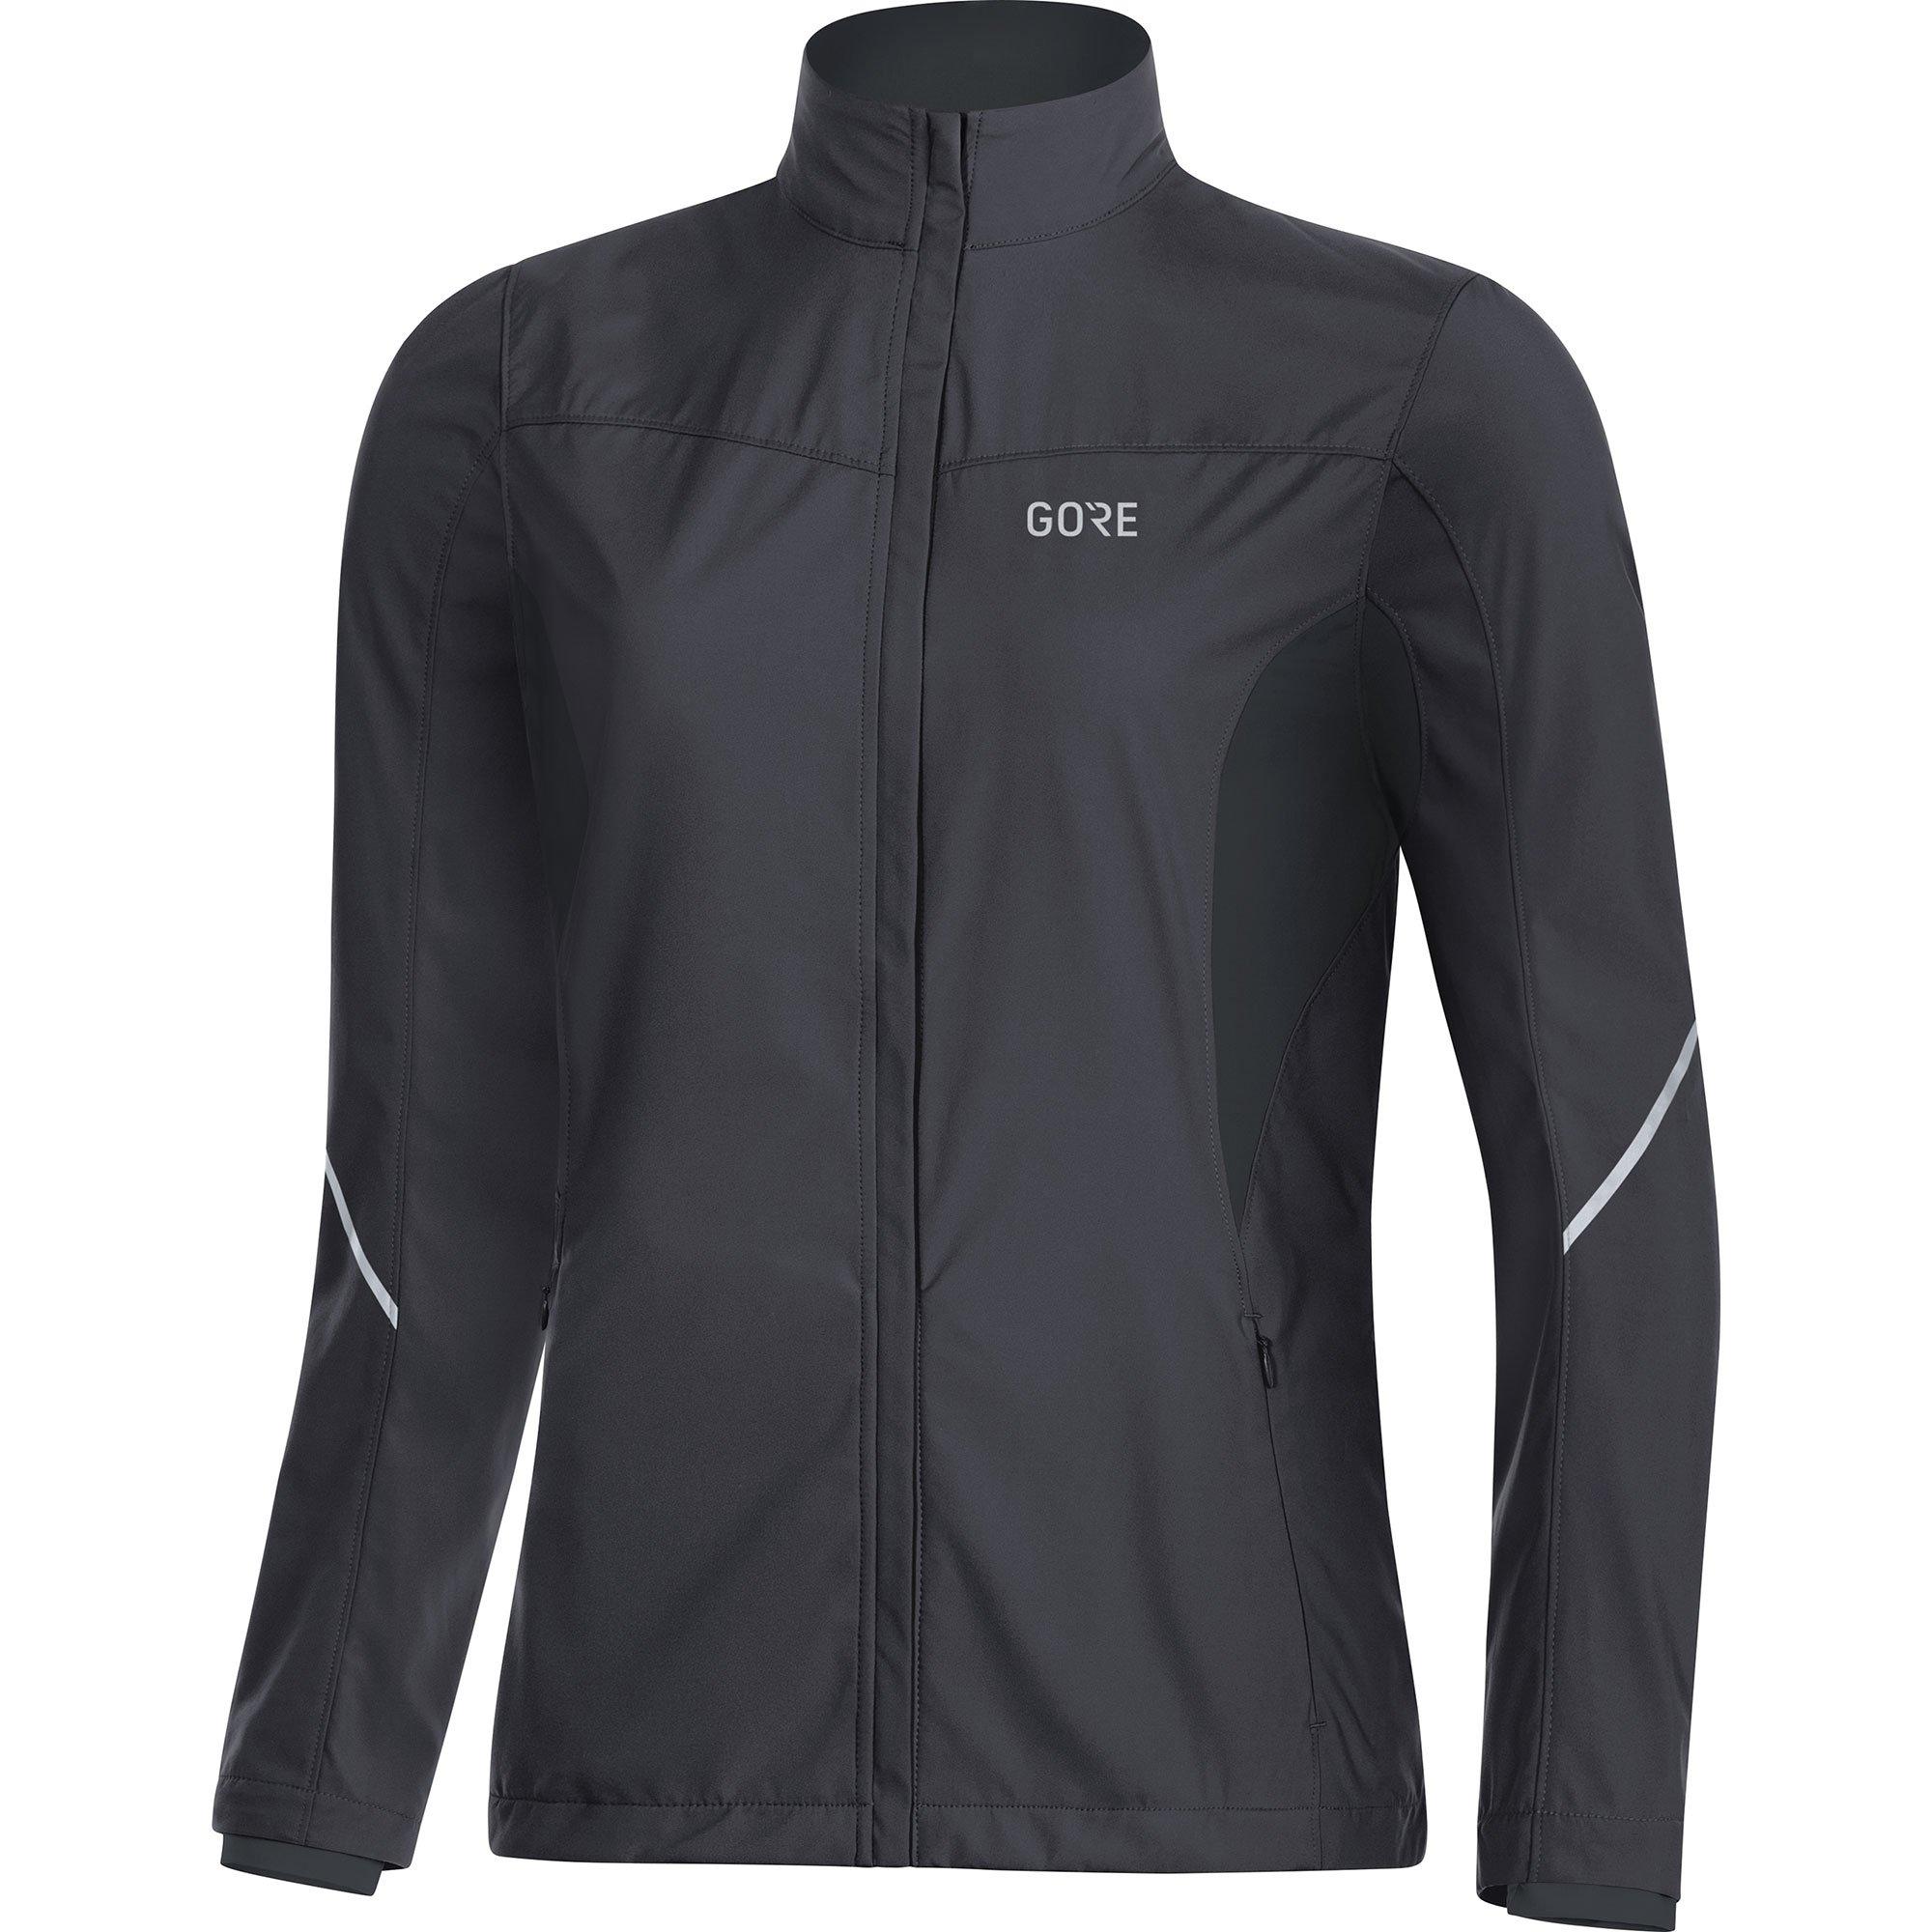 Gore Women's R3 Wmn Partial Gws Jacket,  terra grey/black,  M by GORE WEAR (Image #2)